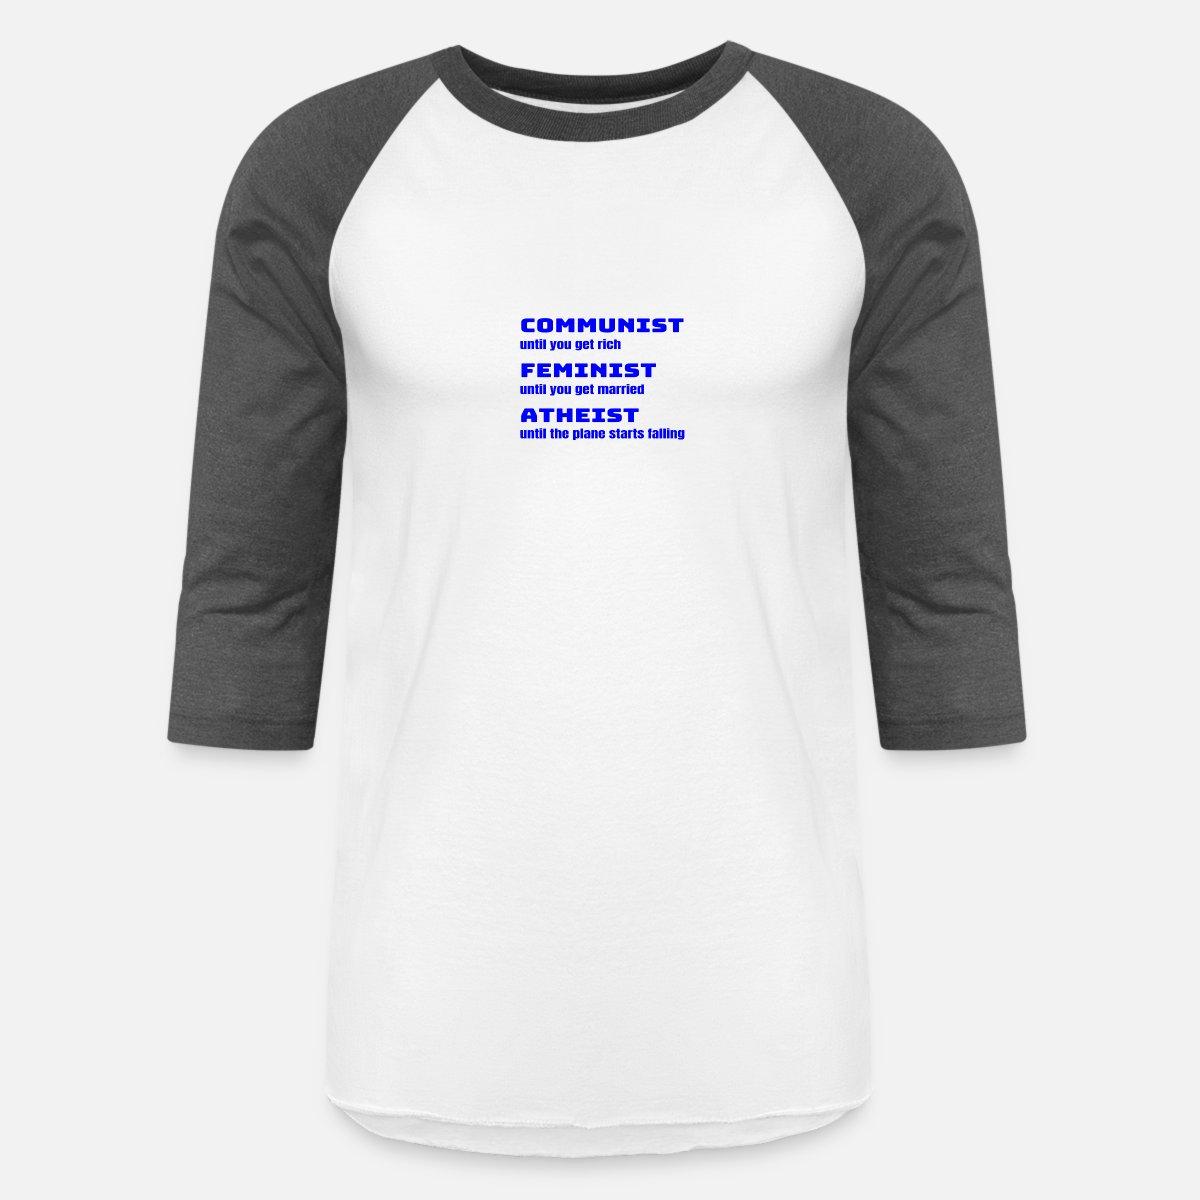 7ecf45efa Unisex Baseball T-ShirtFunny Sarcastic Anti-Liberal For Conservatives